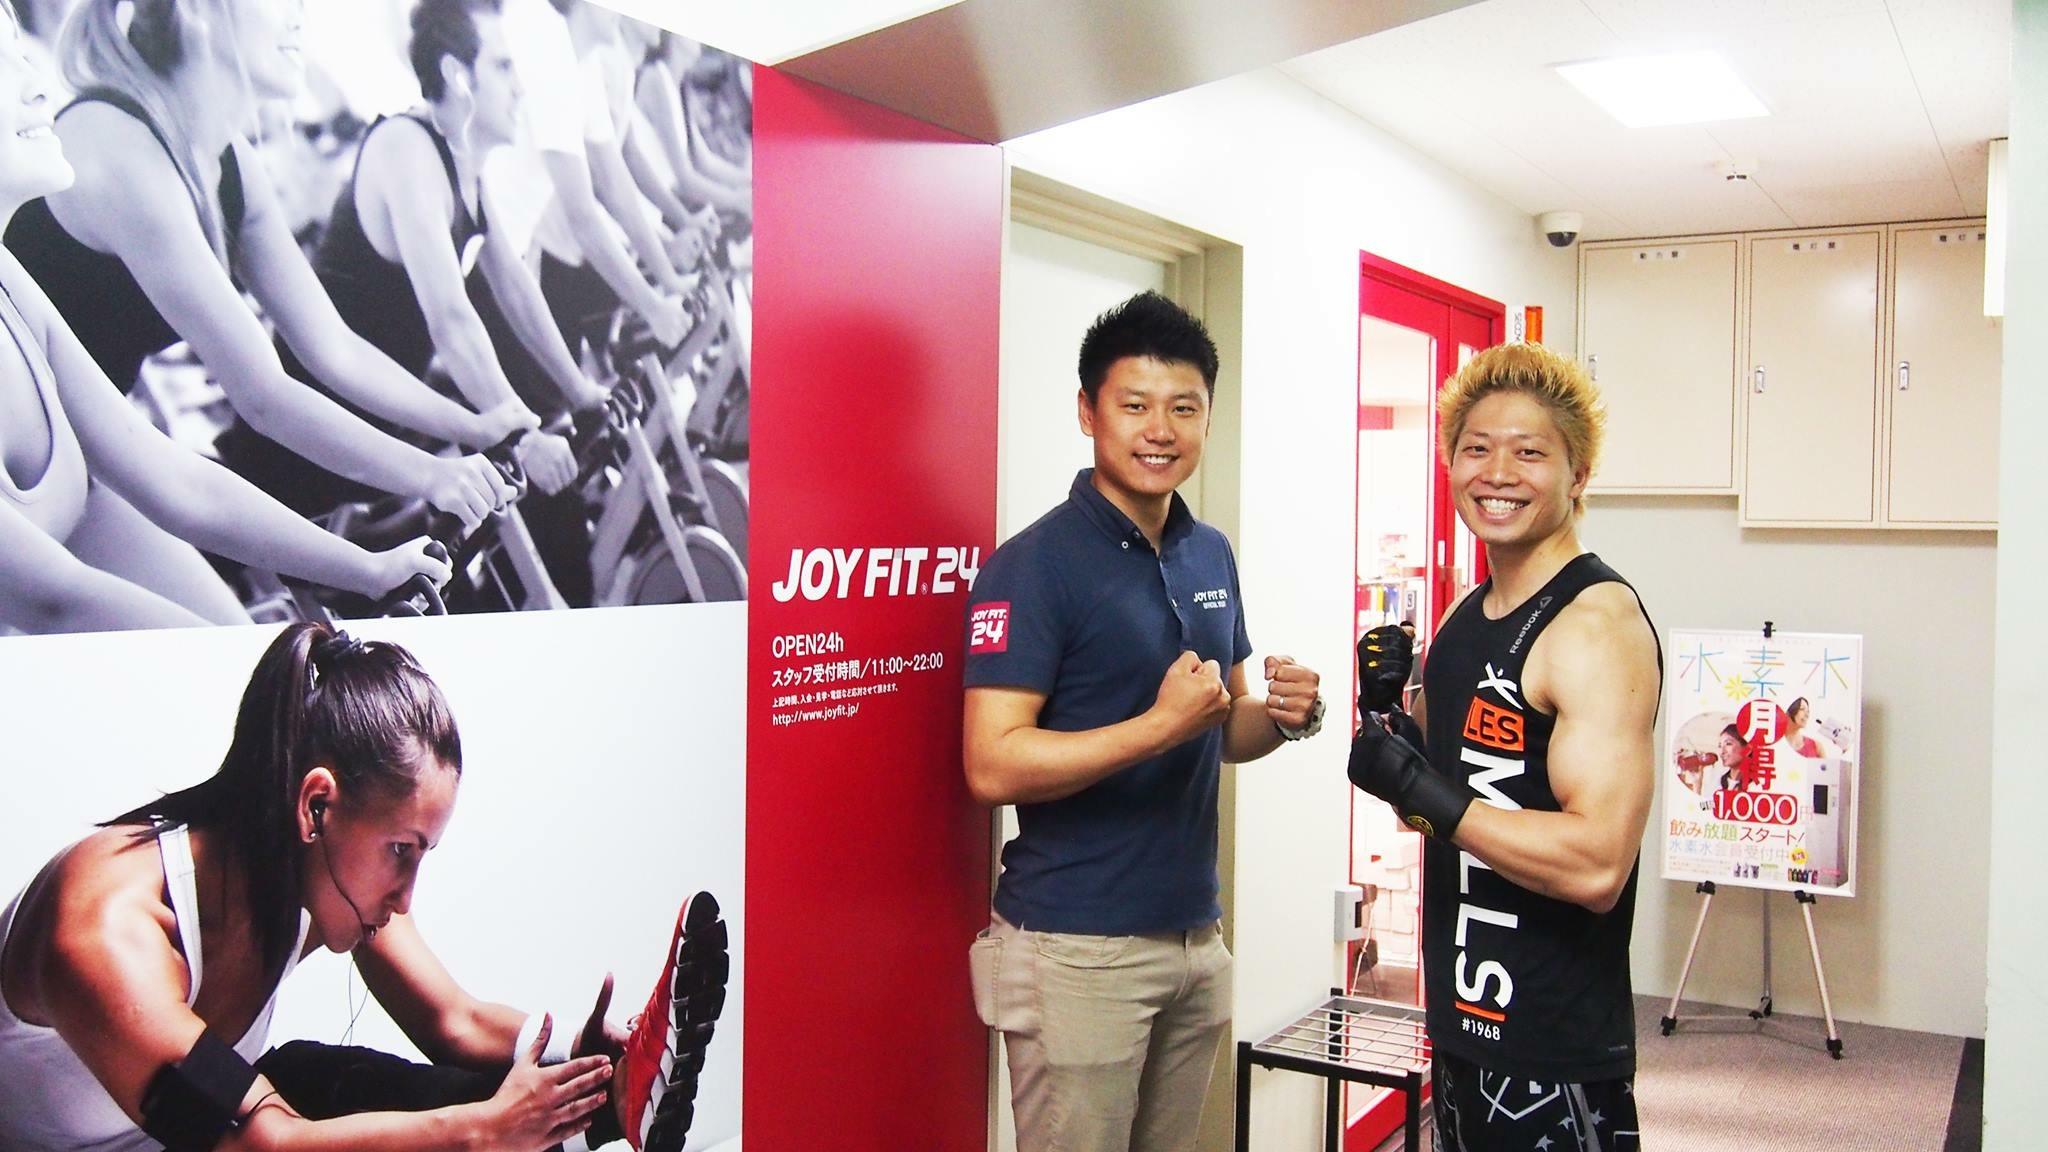 JOYFIT24会員サポートサービス